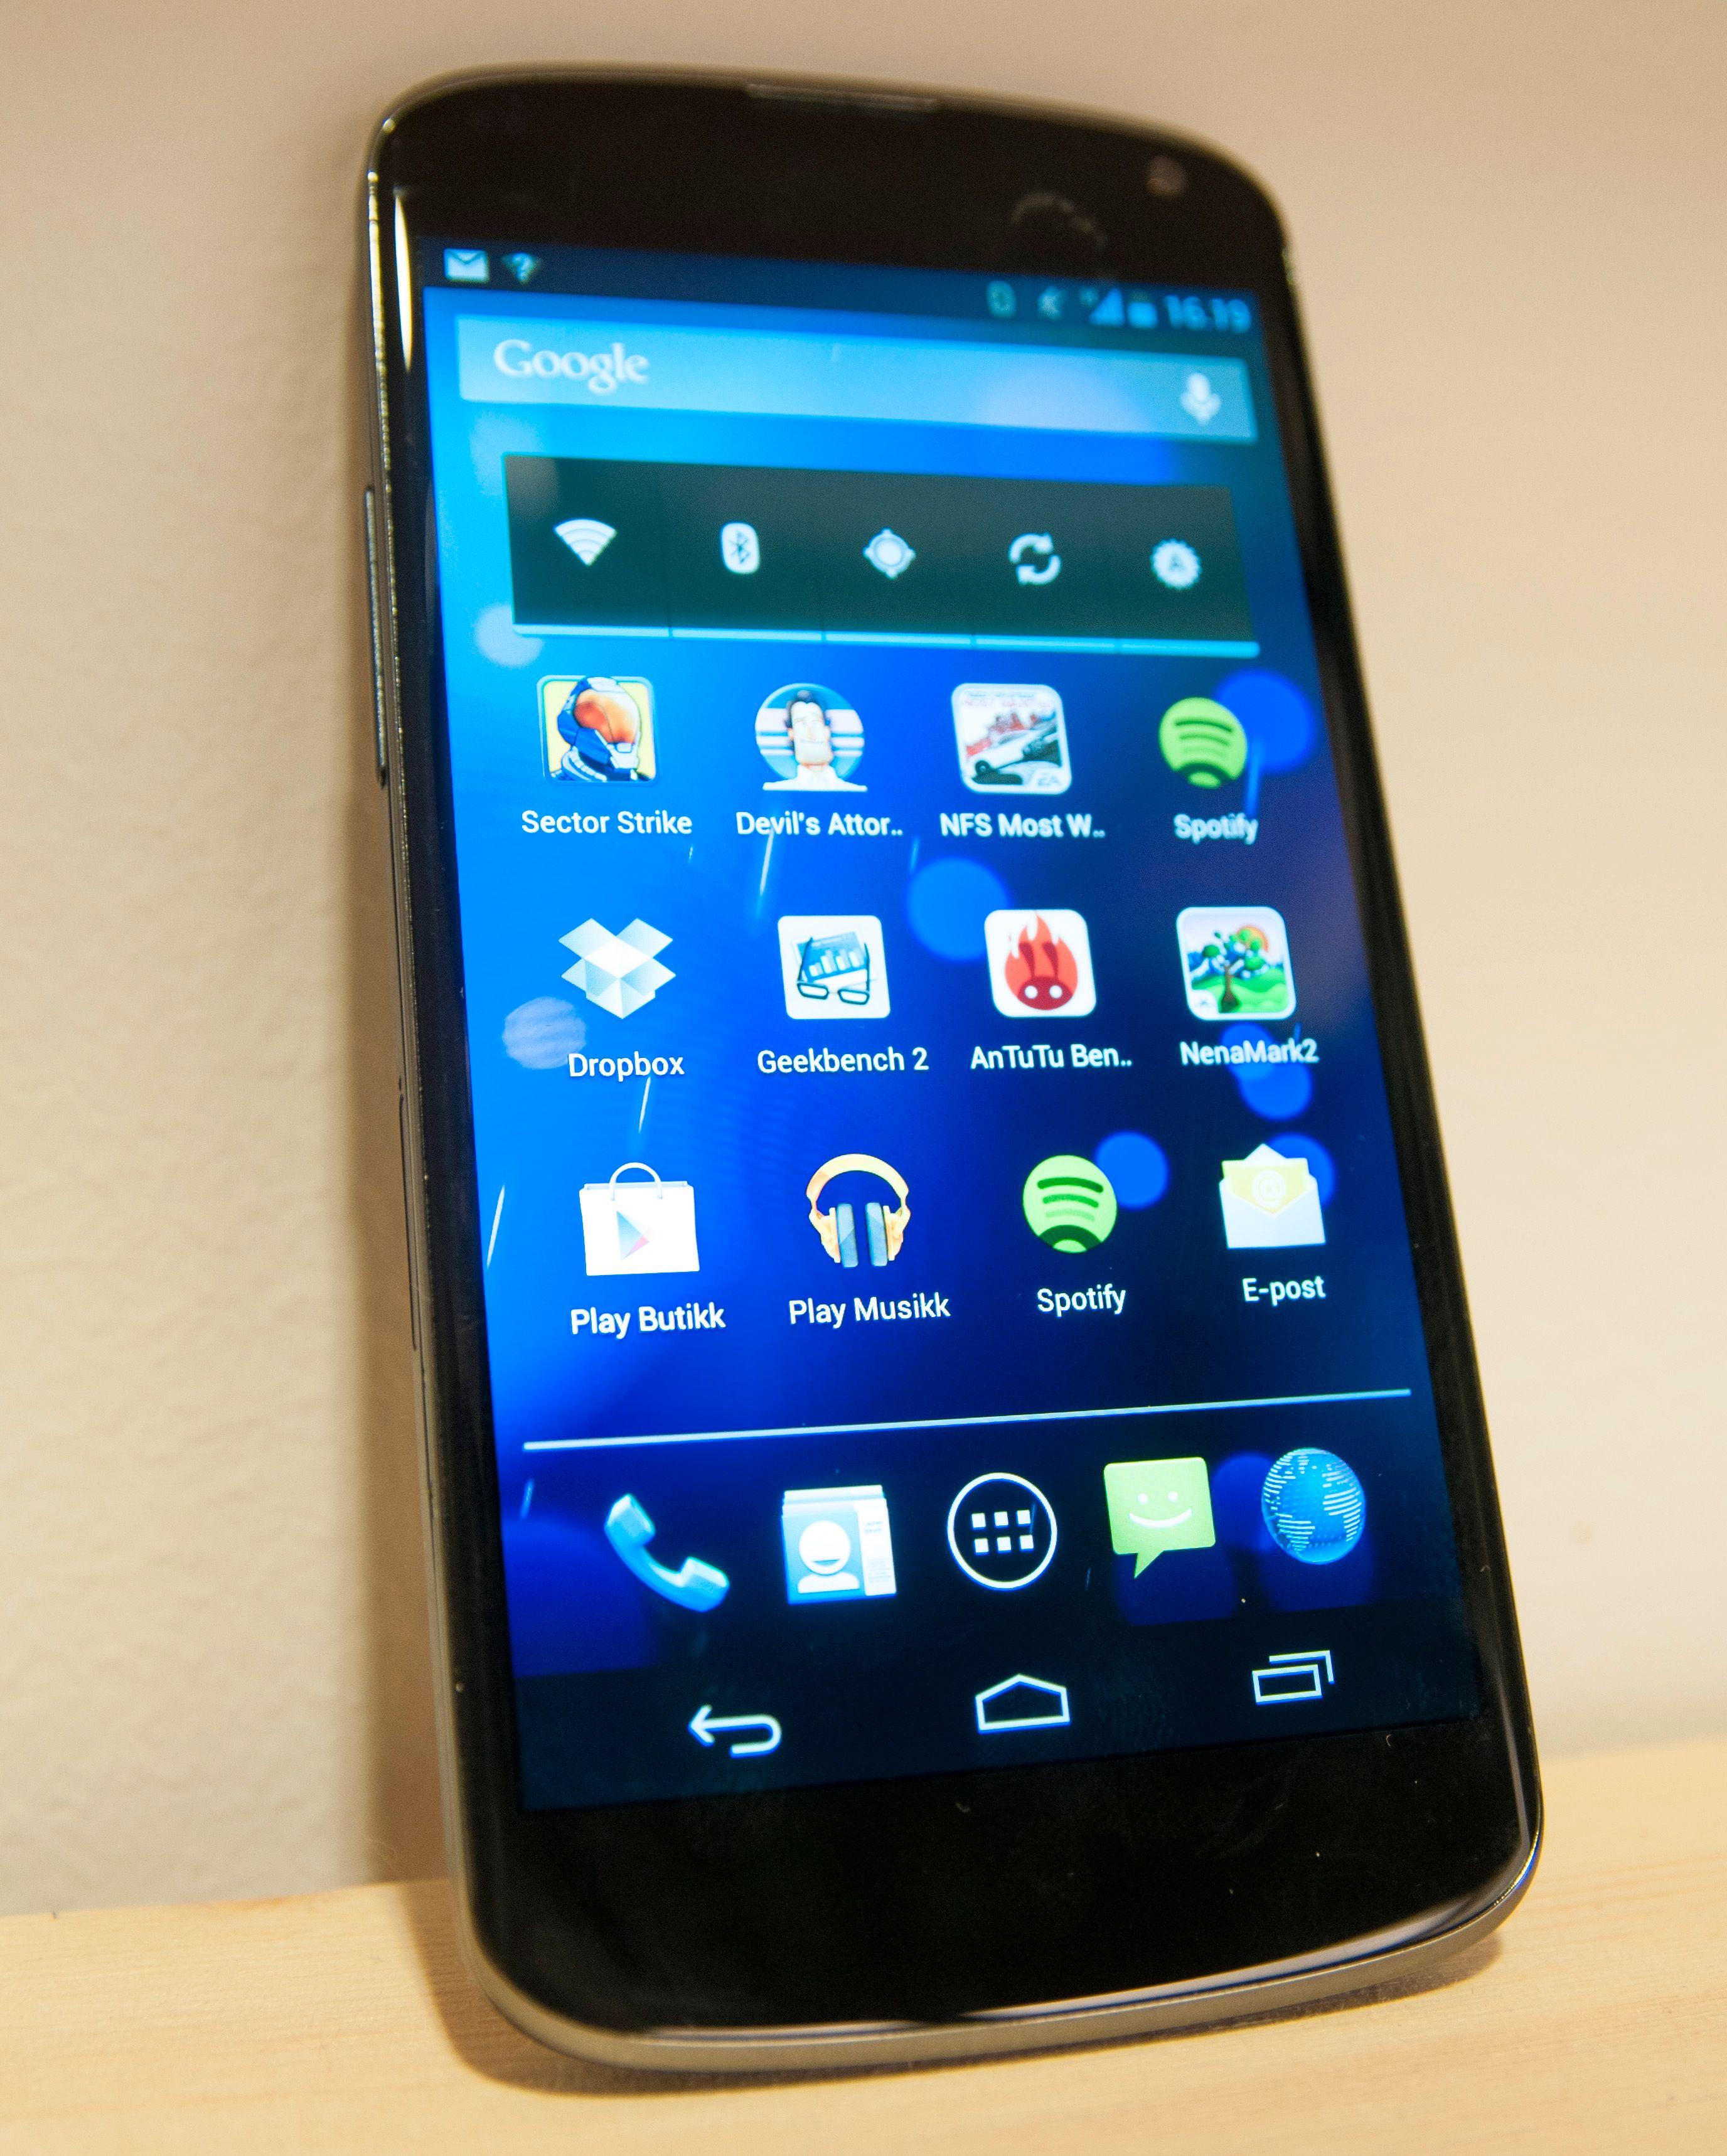 Slik ser LG Nexus 4 ut på nært hold.Foto: Finn Jarle Kvalheim, Amobil.no